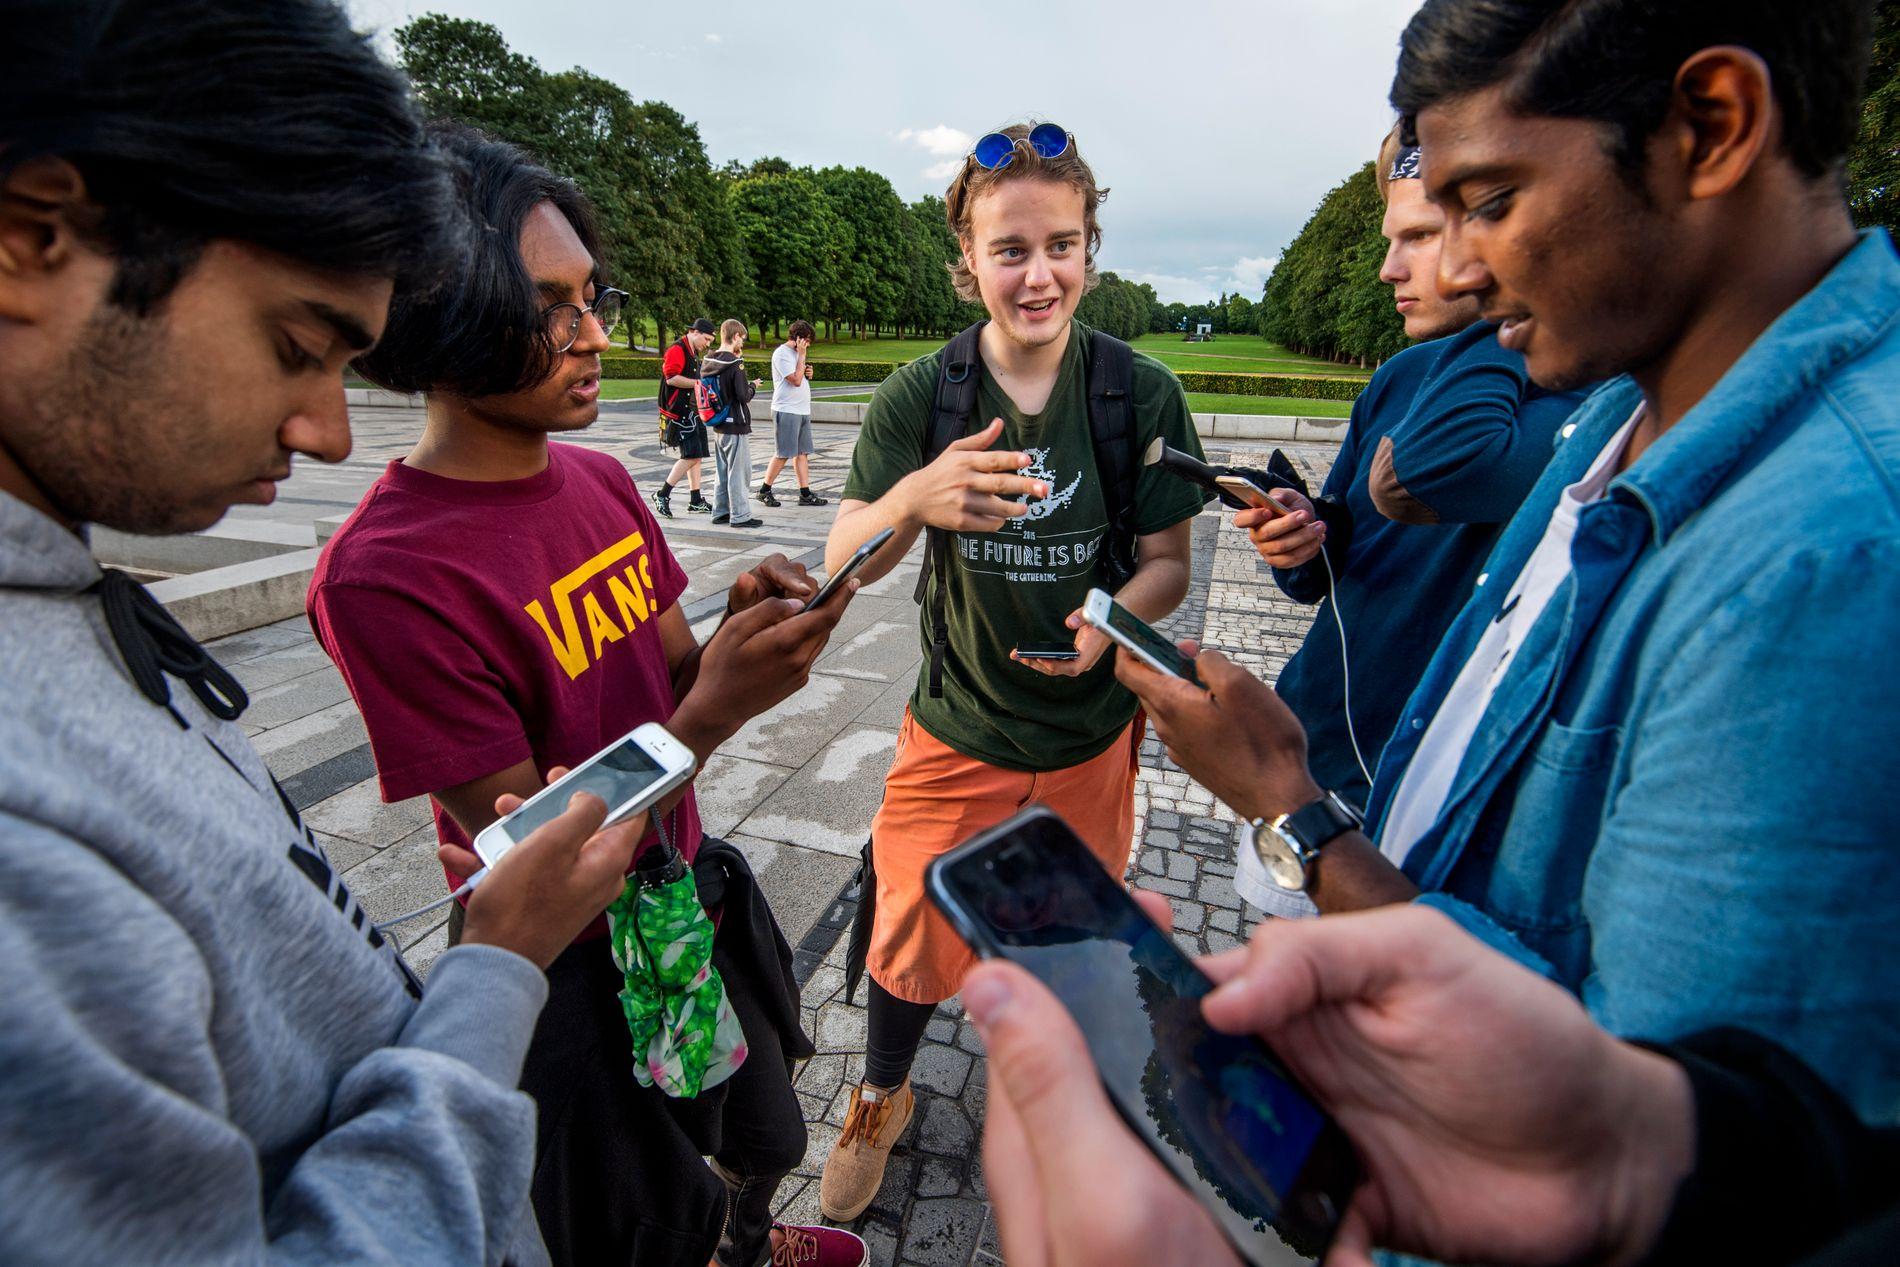 FANG POKÈMON: Kameratgjengen fra Oslo dro samlet på Pokémon jakt i Frognerparken. Are (19) Aron Snell (19) Aadsaiy (18) Jesper (17) Terje (19) Jeremy Croos (19) Squirtle - vann Pokemon ved fontenen i Frognerparken.